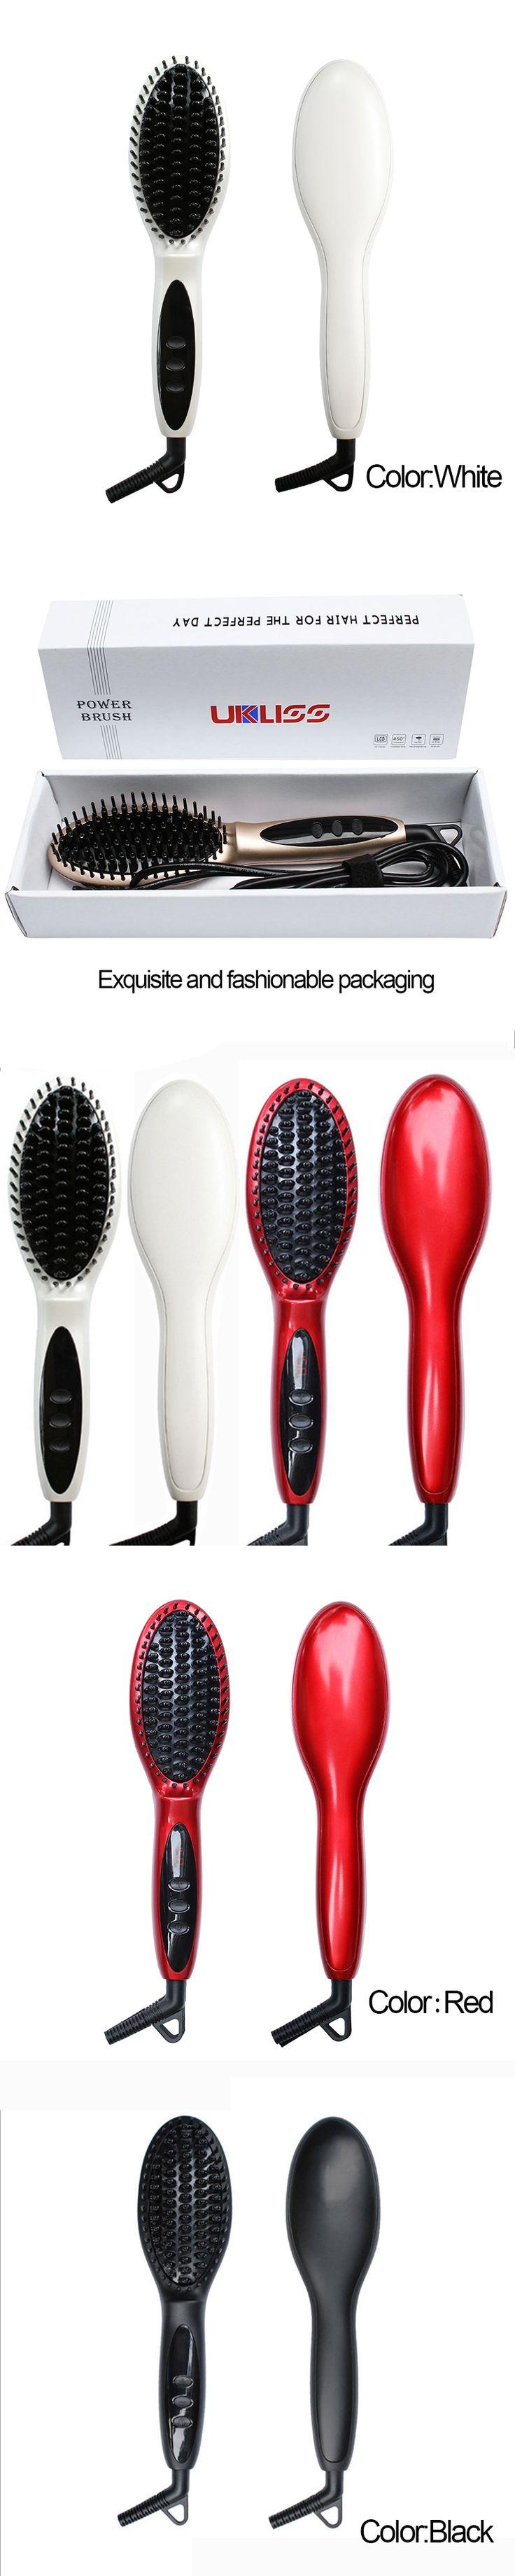 2017 Constant Temperature Hair Brush Fast Hair Straightener Comb hair Electric brush comb Irons Auto Straight Hair Comb brush